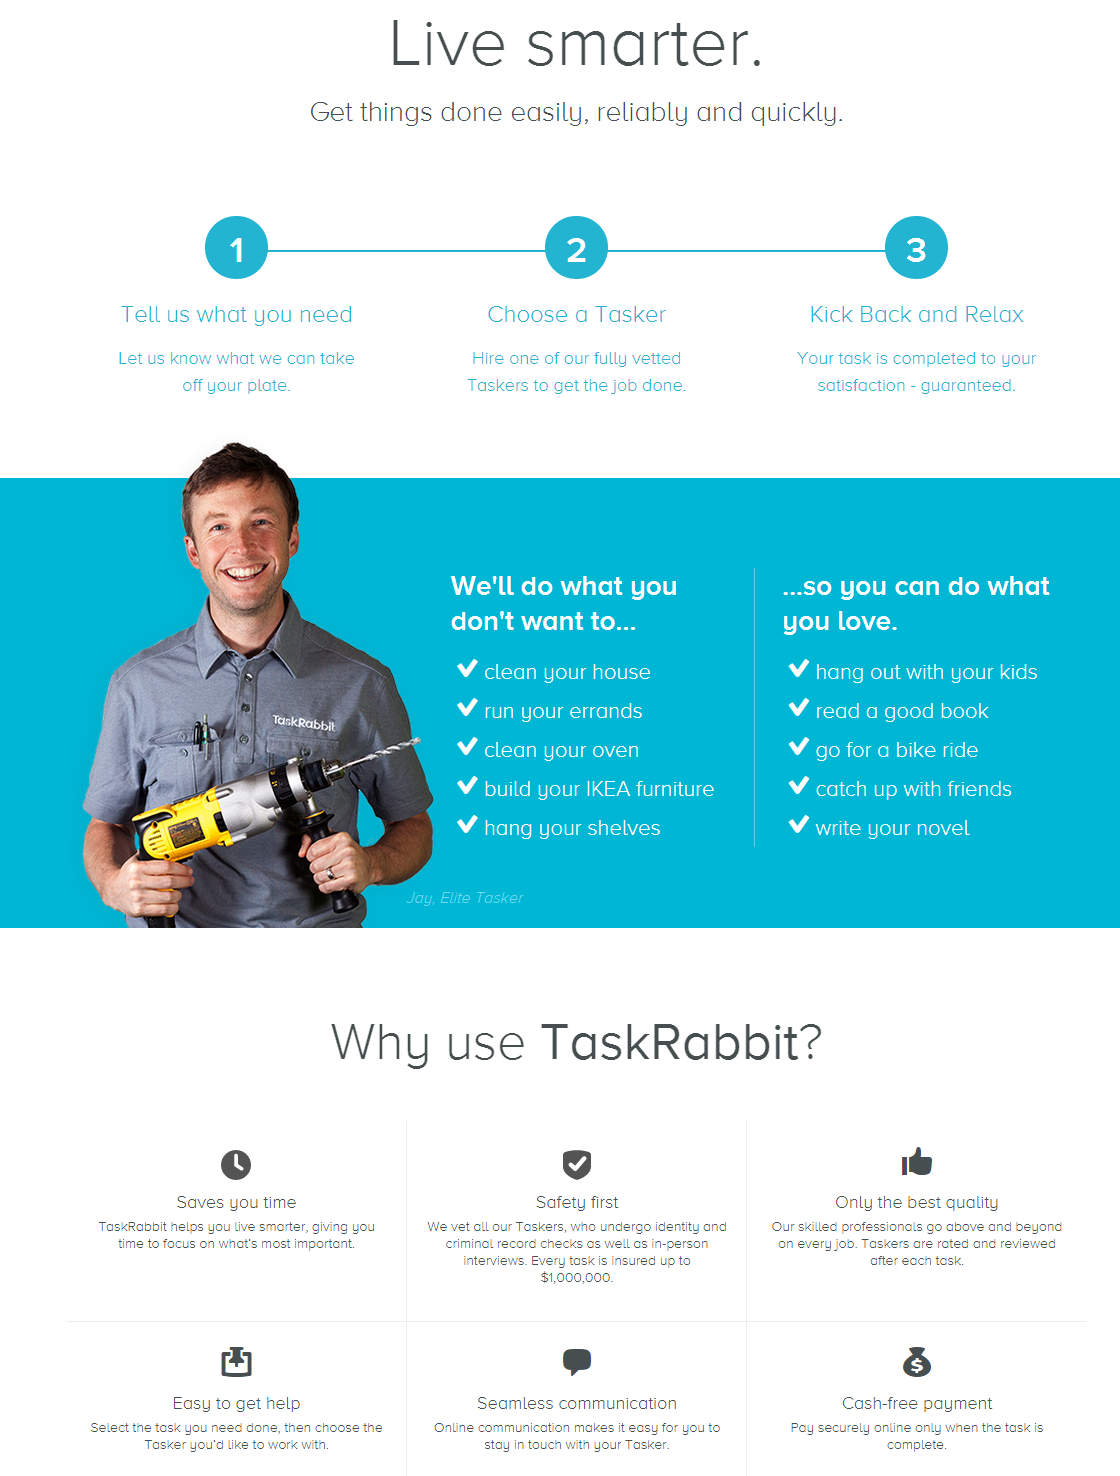 live smarter task rabbit